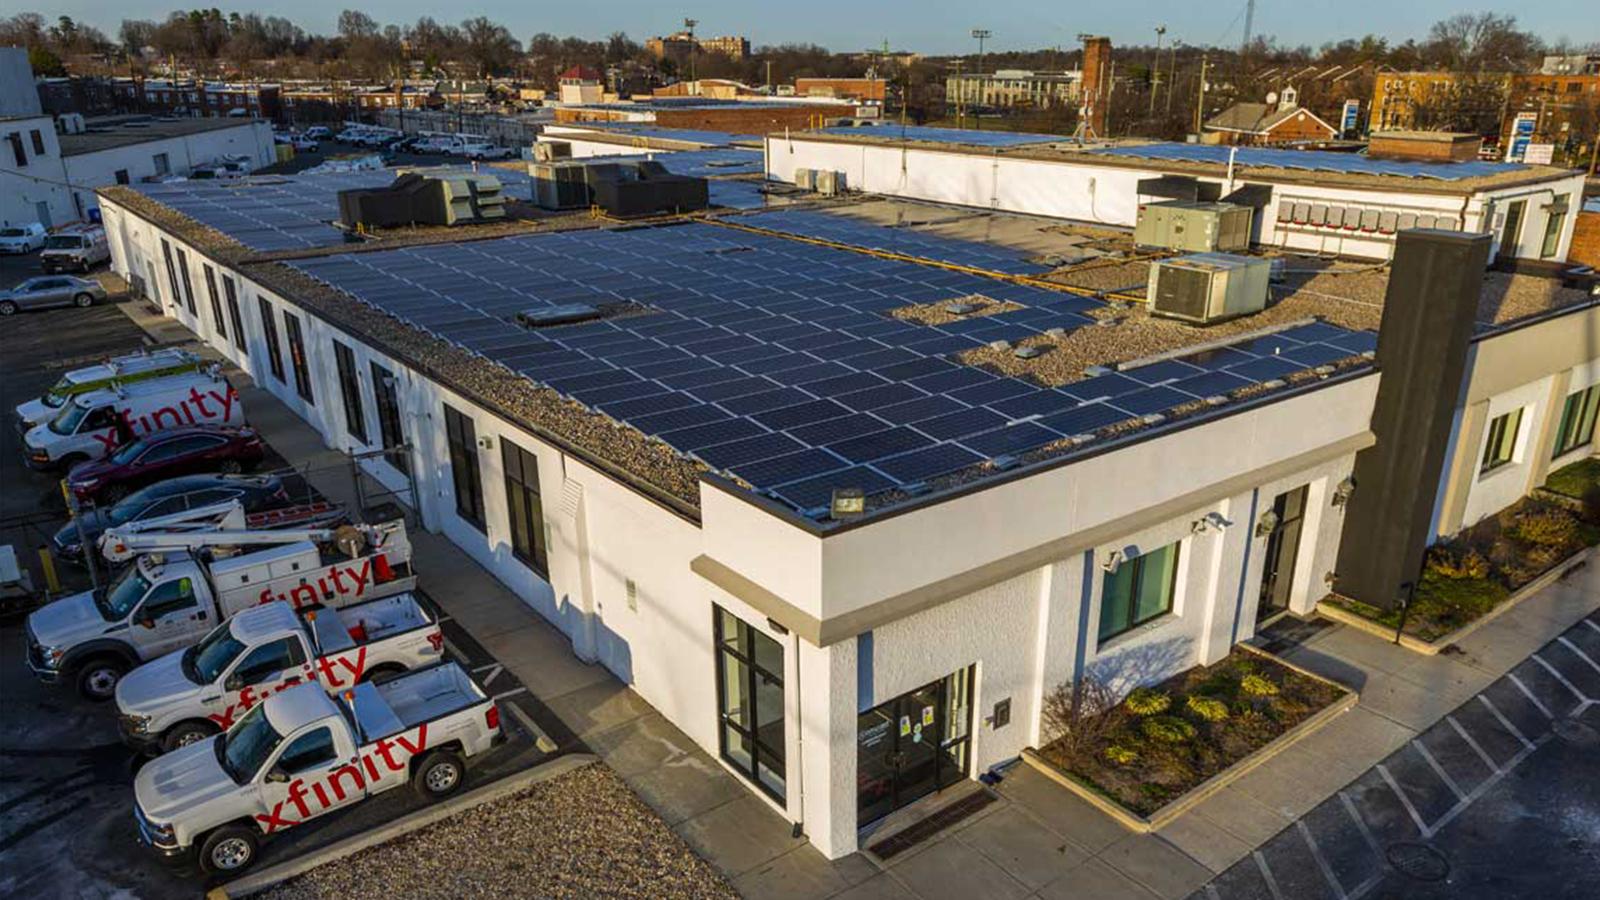 The new Solar System Installation for Washington, D.C., Facility